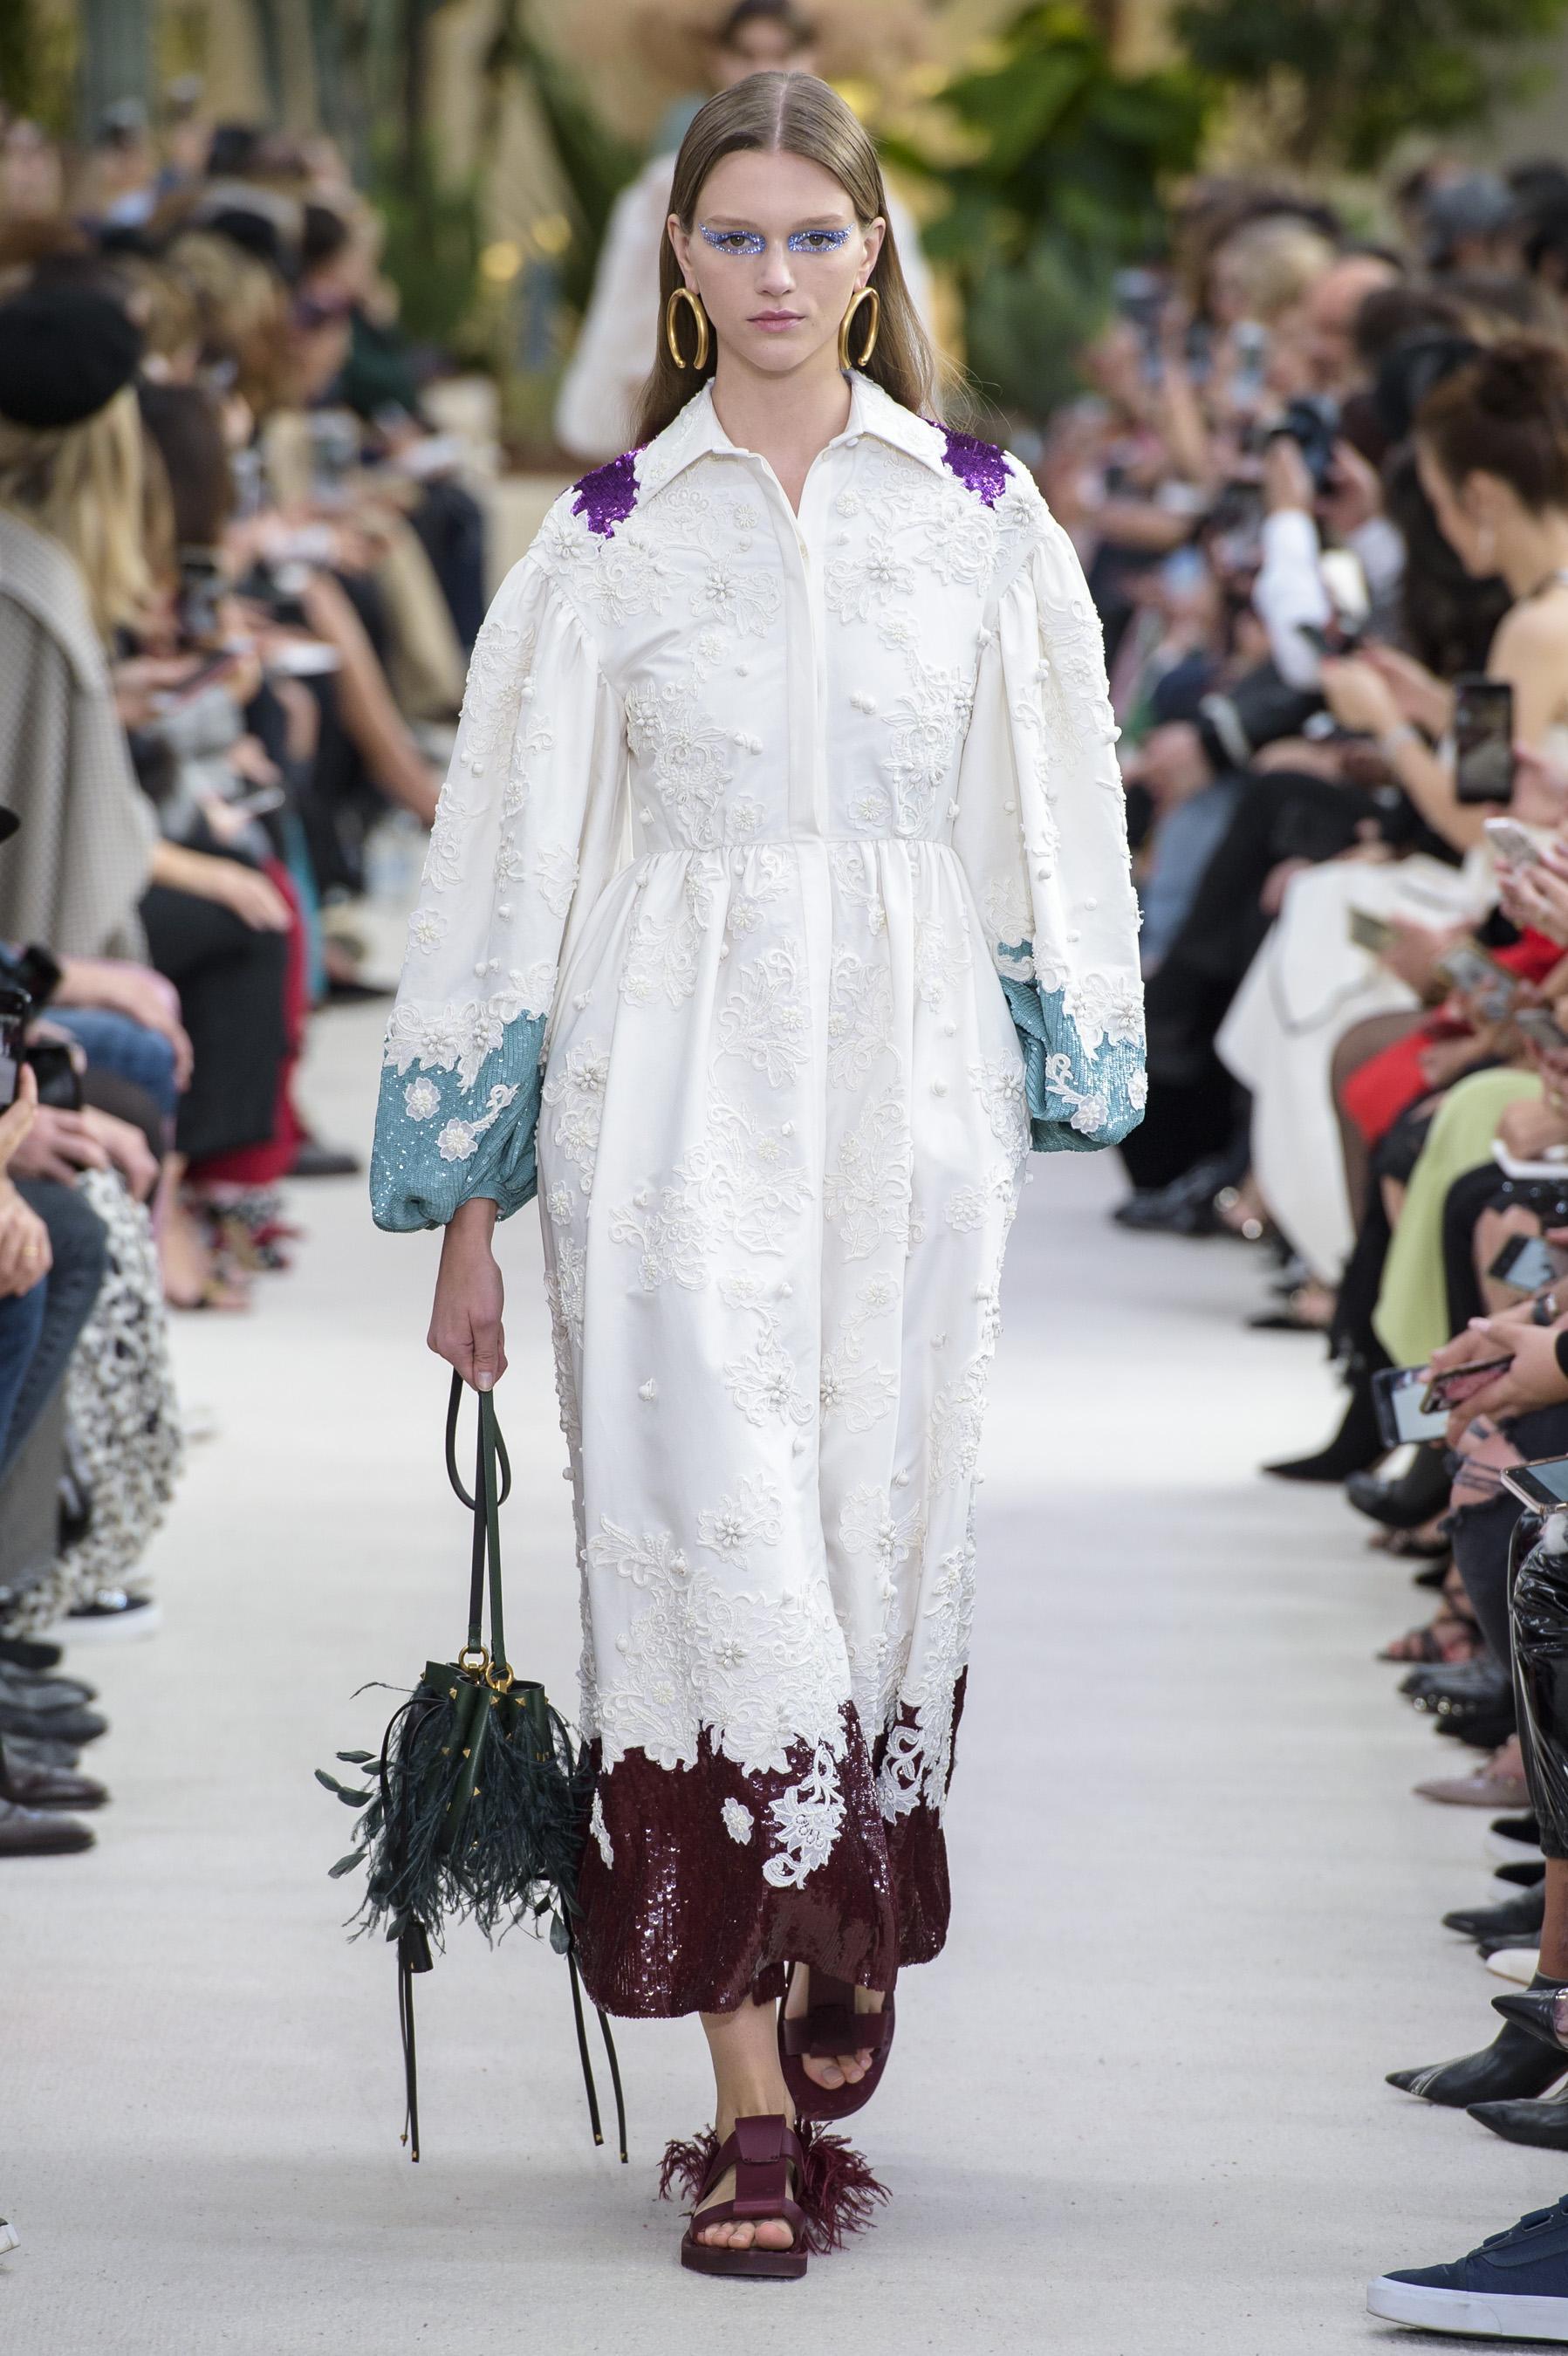 a02d6122639 Défilé Valentino printemps-été 2019 Prêt-à-porter - Madame Figaro